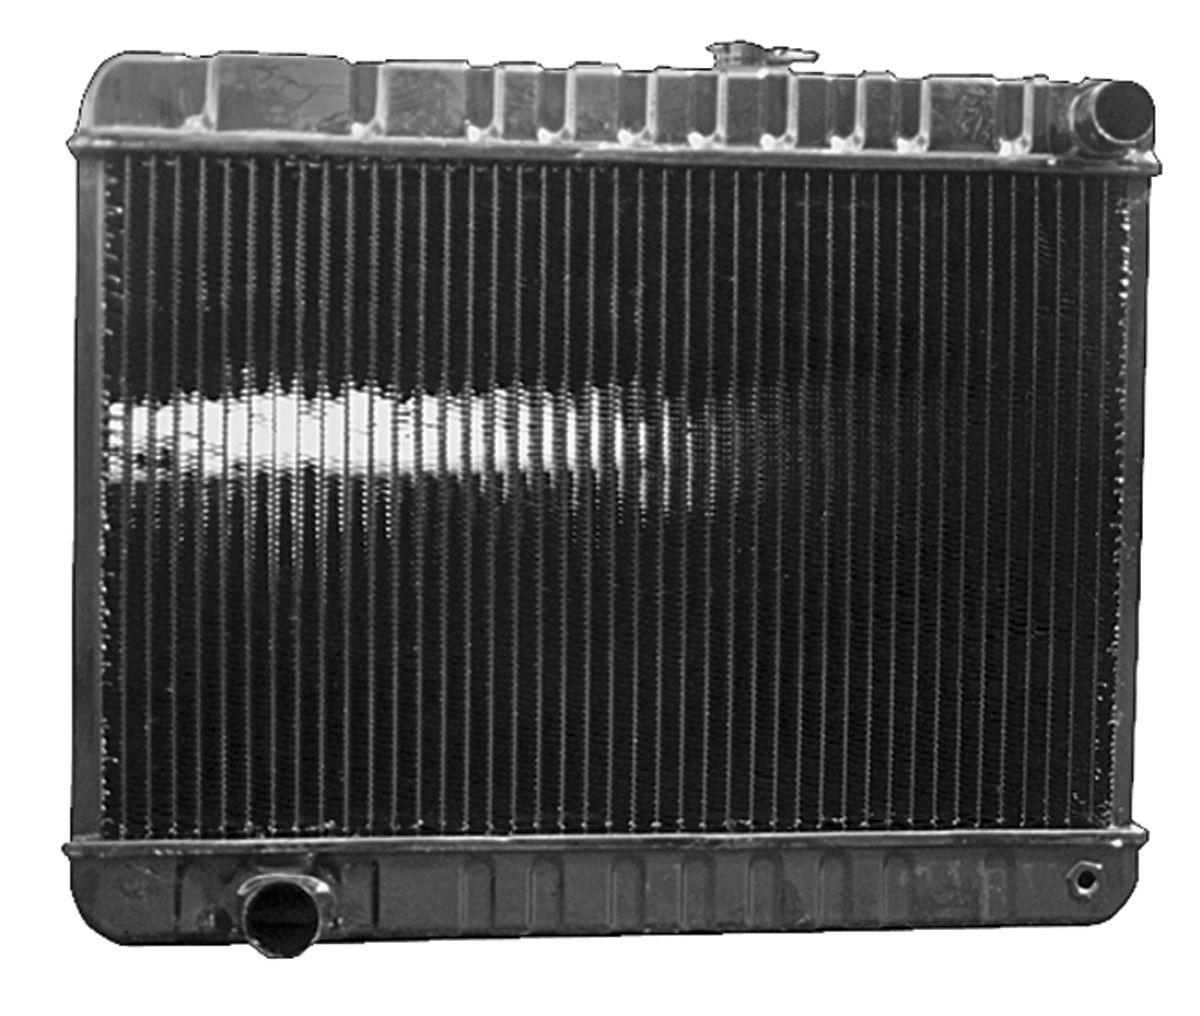 "Radiator, 1961-63 Tempest/LeMans, V8, AT, 3-Row, 12-3/8"" X 24-3/4"" X 2"""